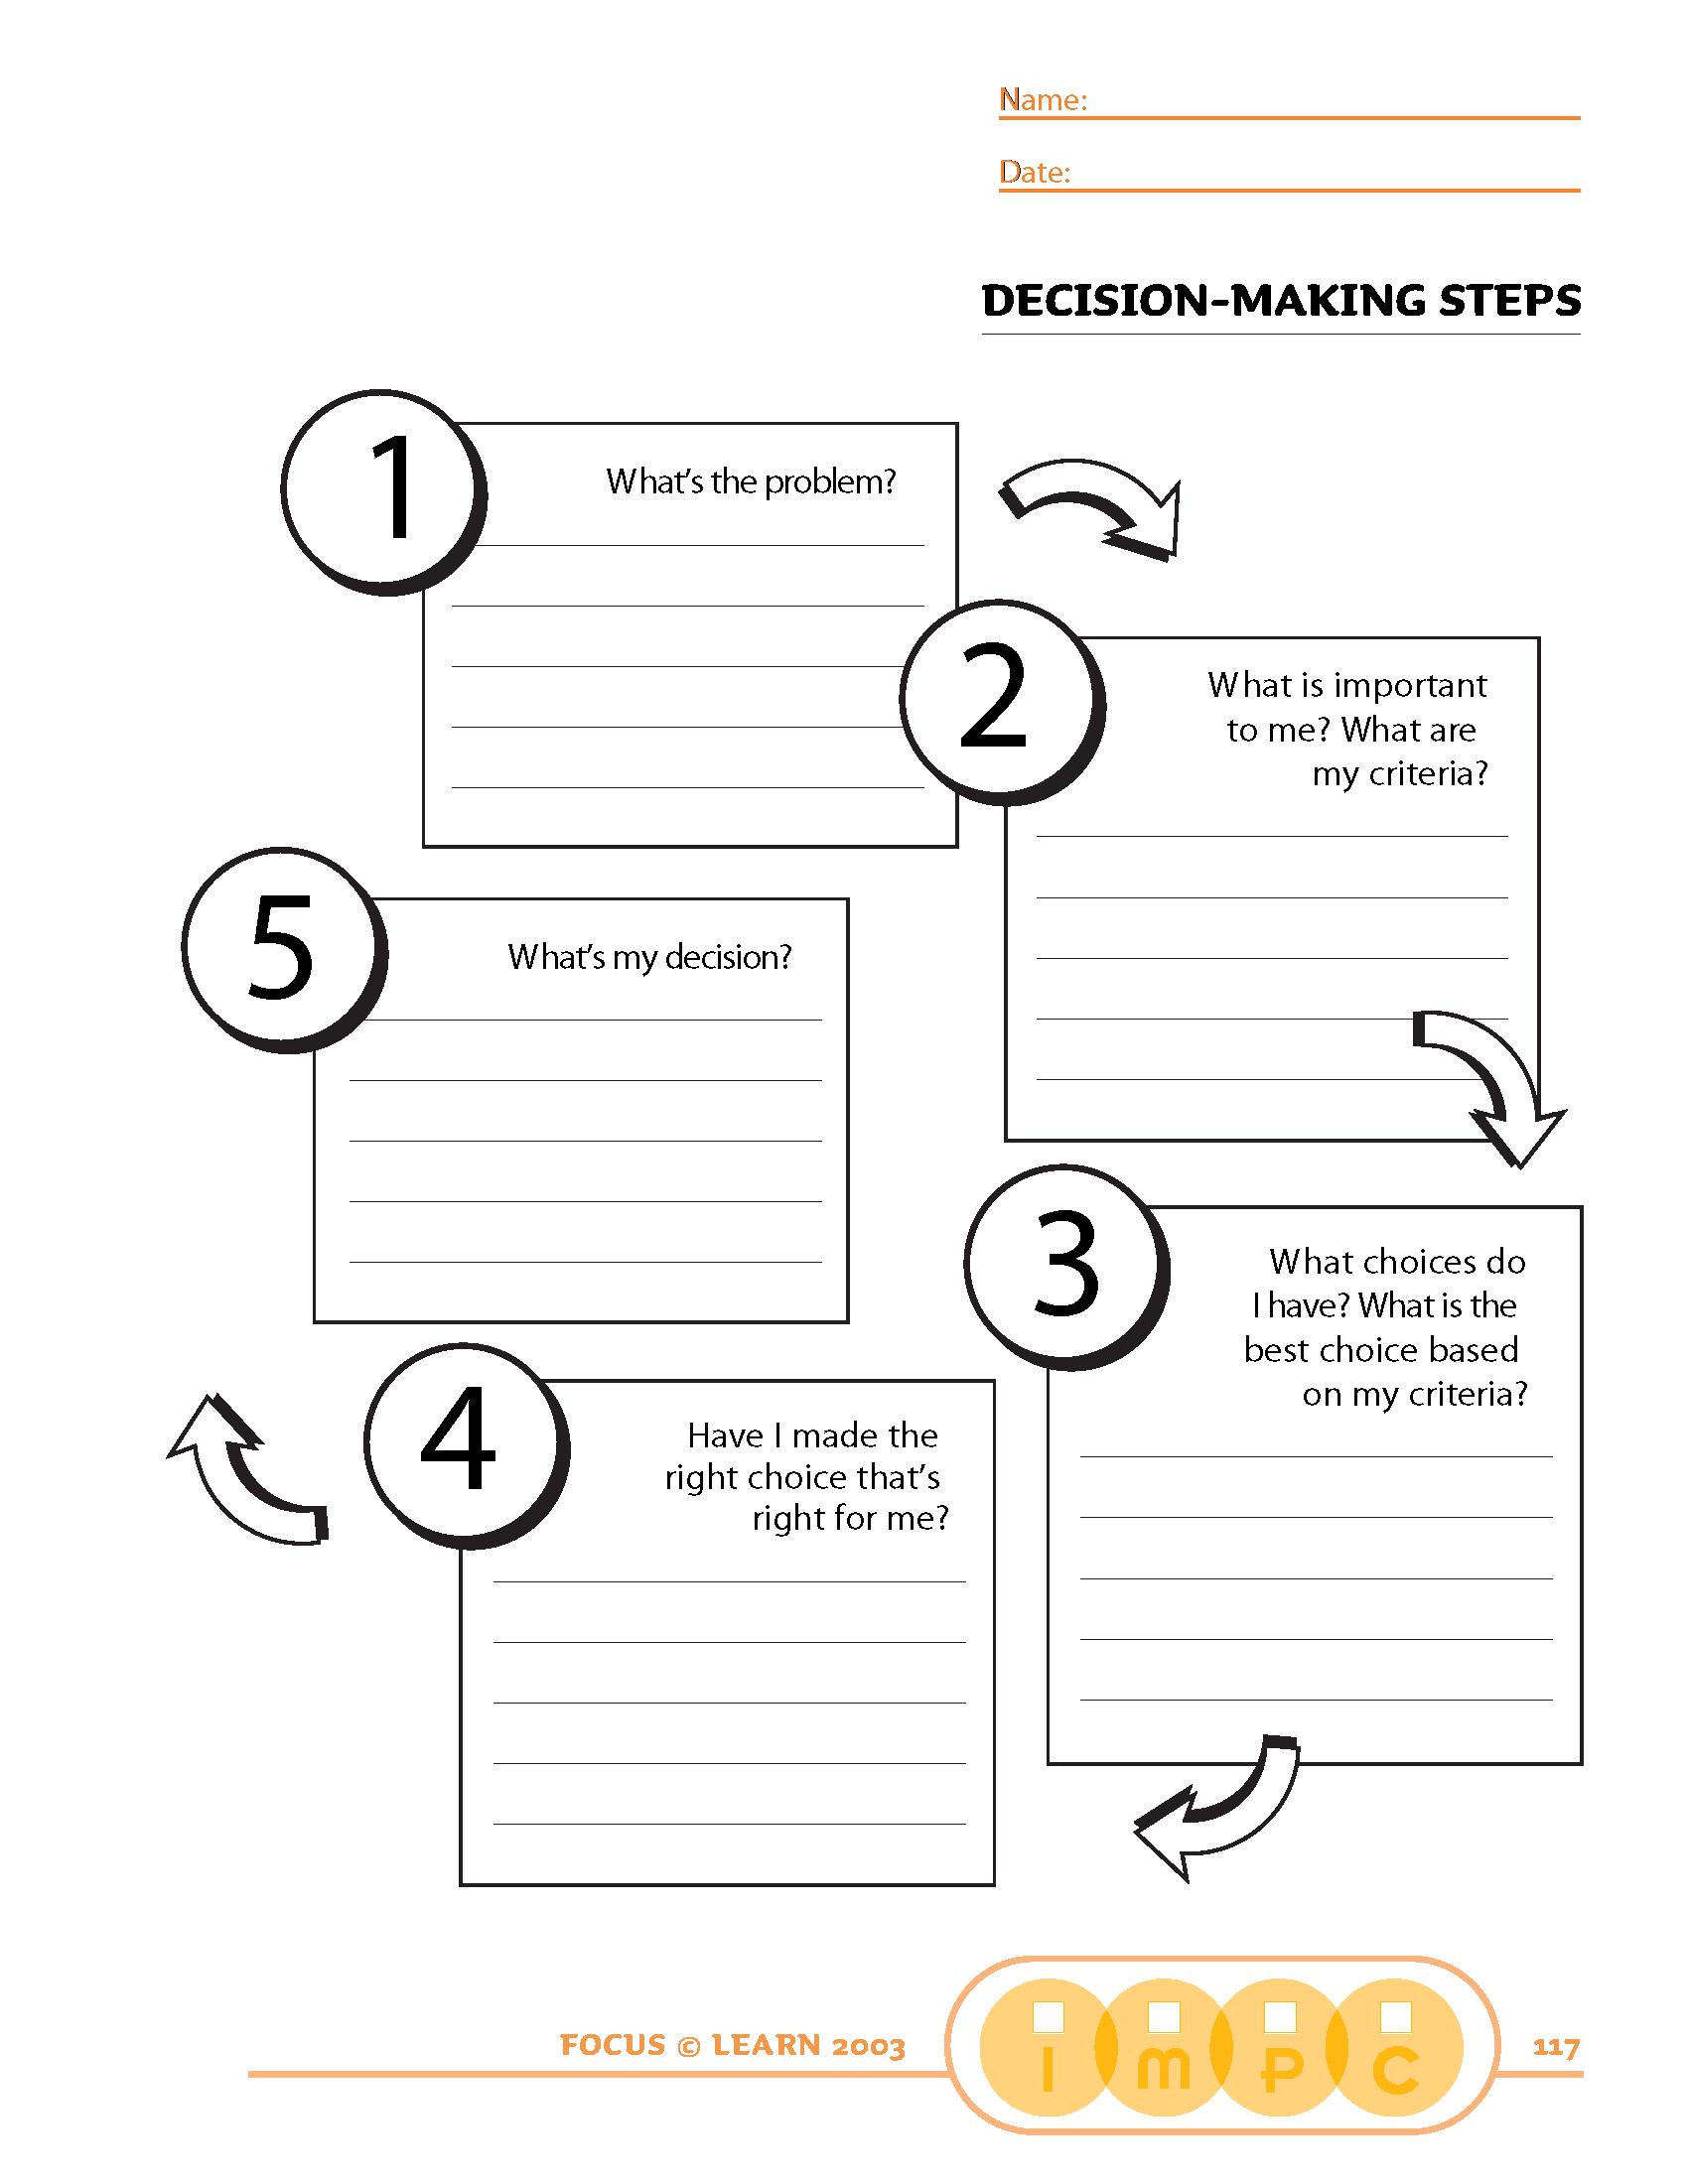 Decision-Making Steps